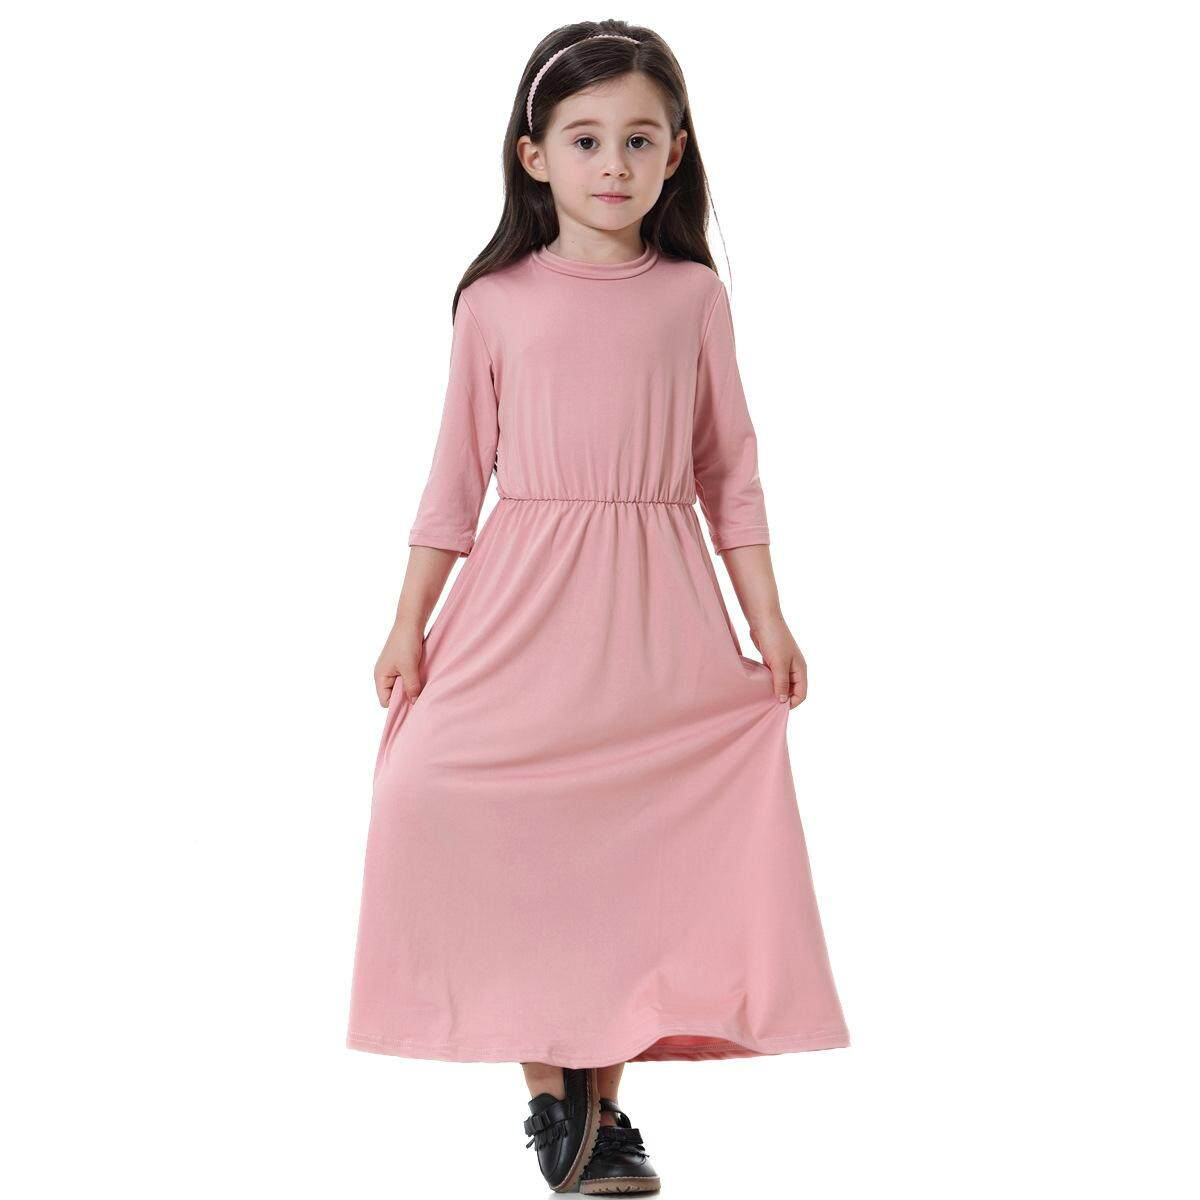 a98e46956a Buy Girls Clothing Dresses | Short Sleeve | Lazada